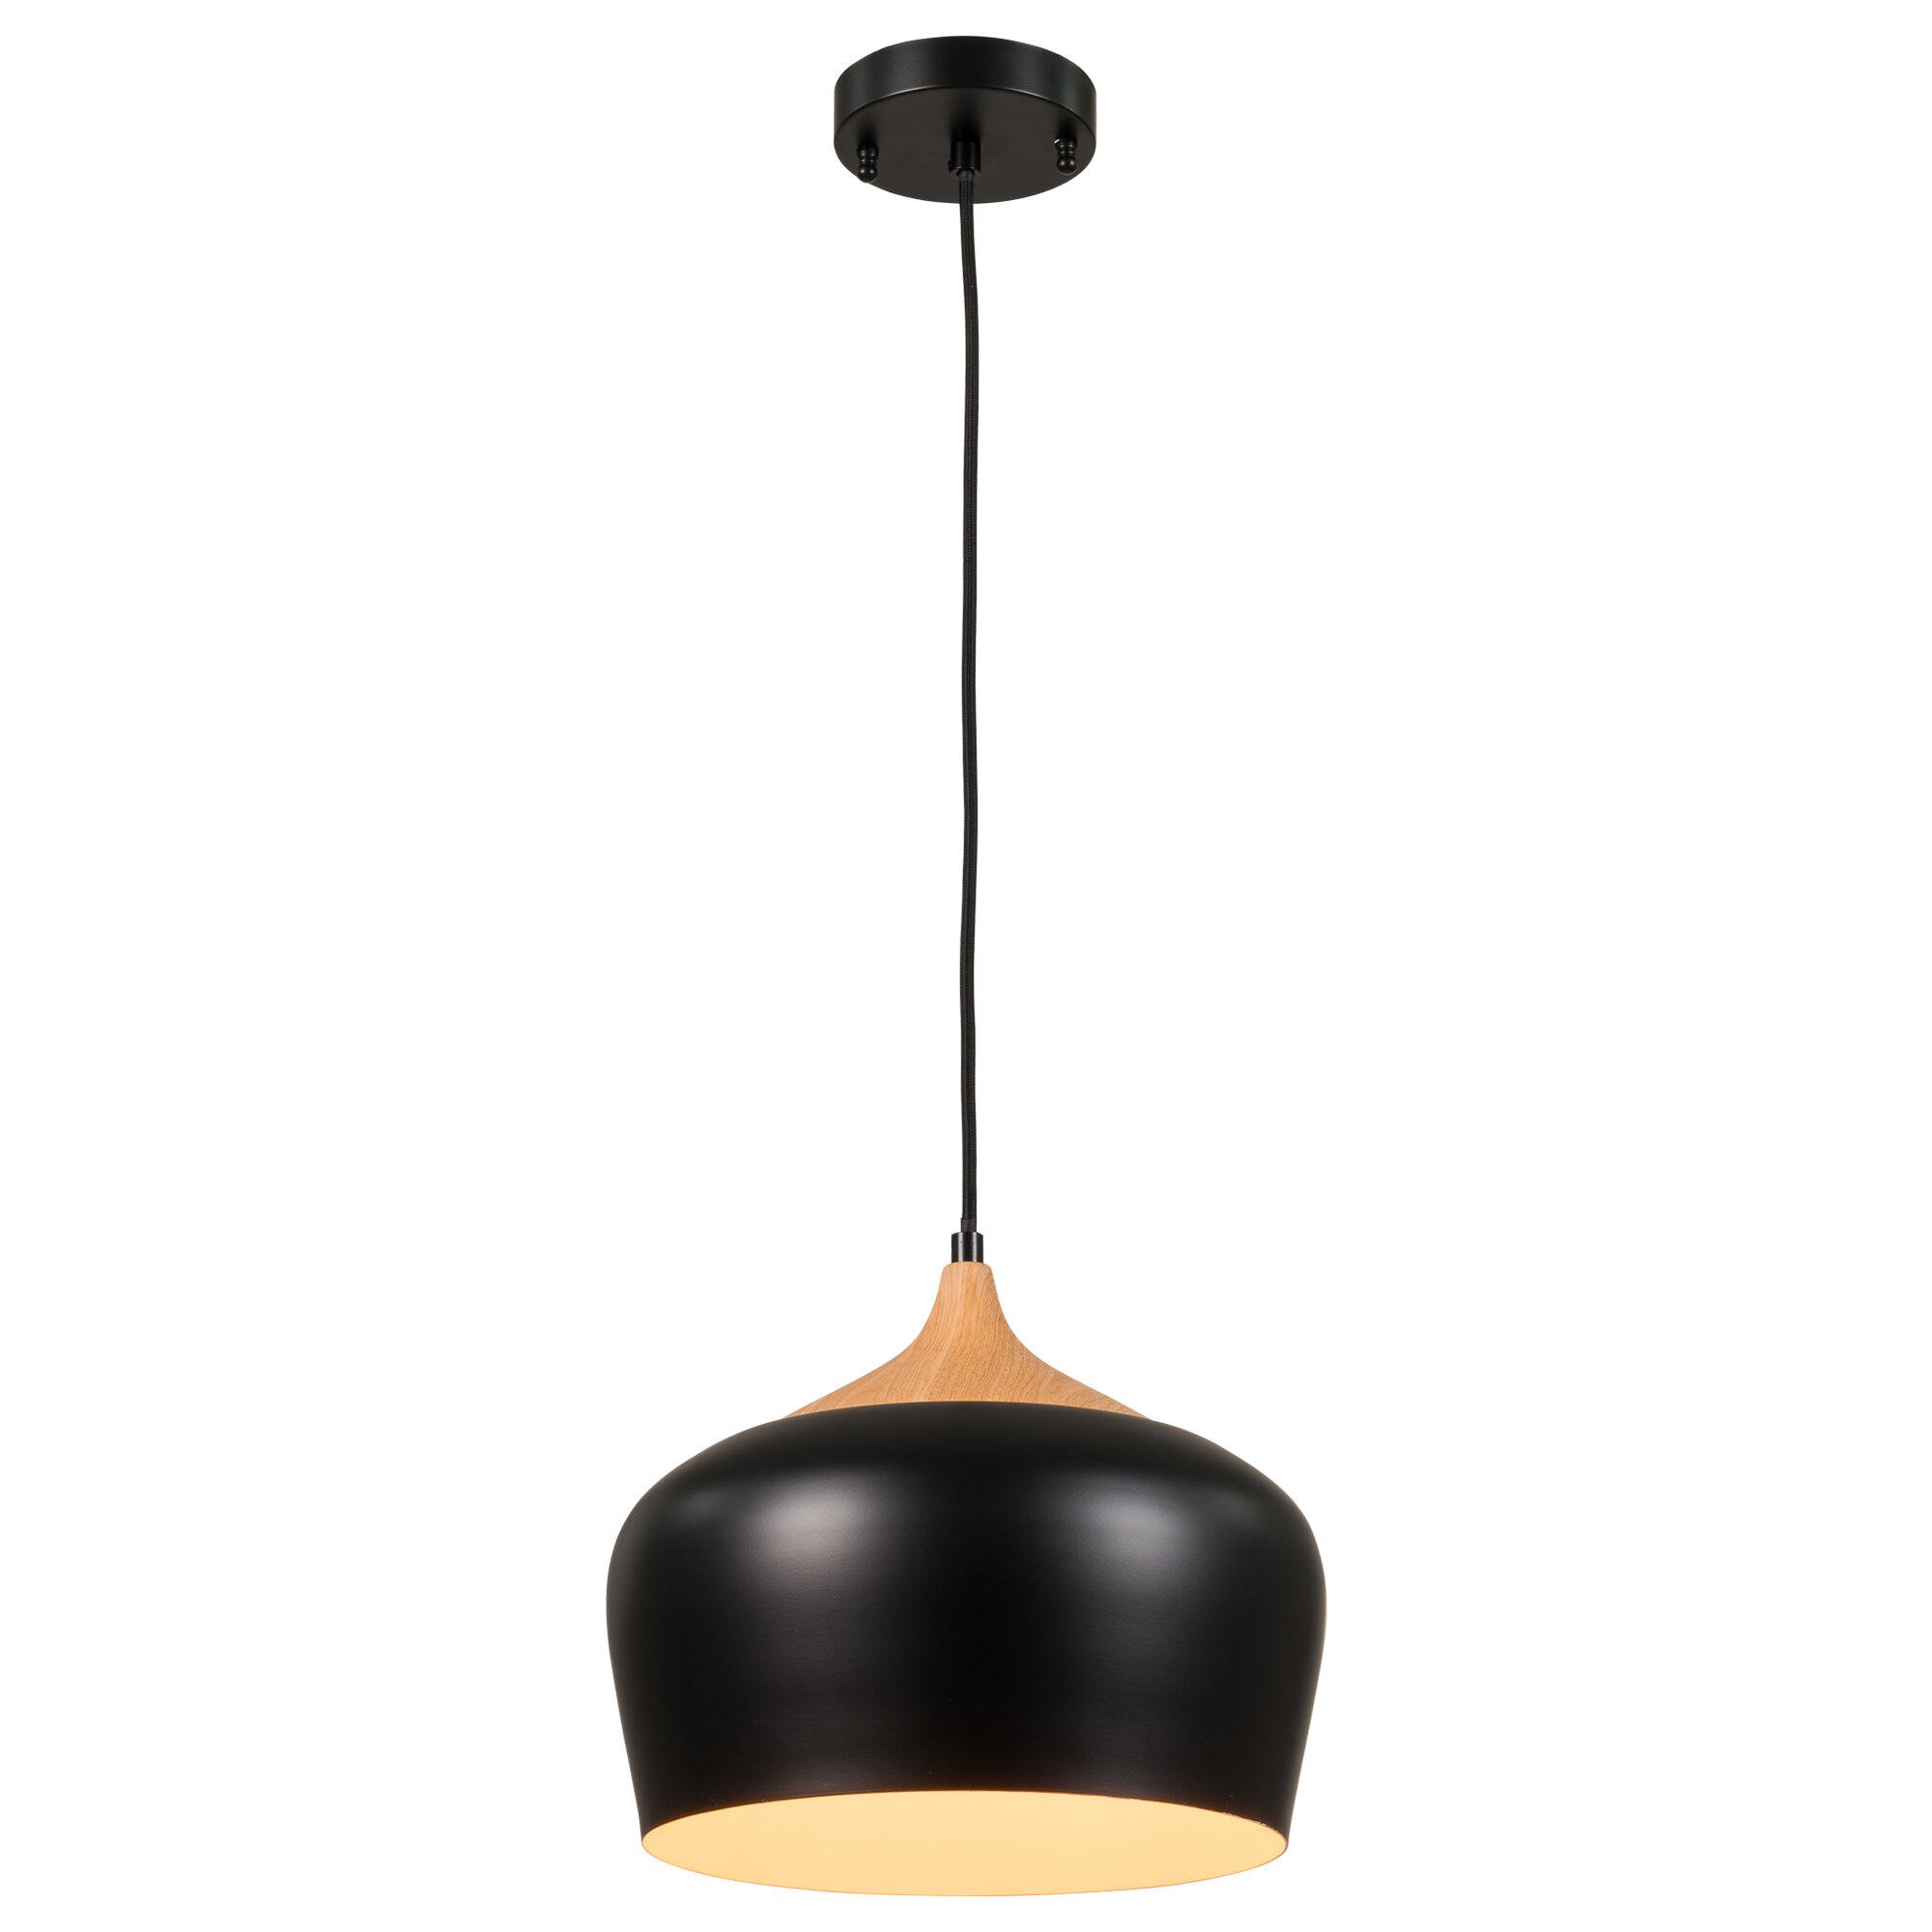 Medium 12 16 Wide George Oliver Pendant Lighting You Ll Love In 2021 Wayfair